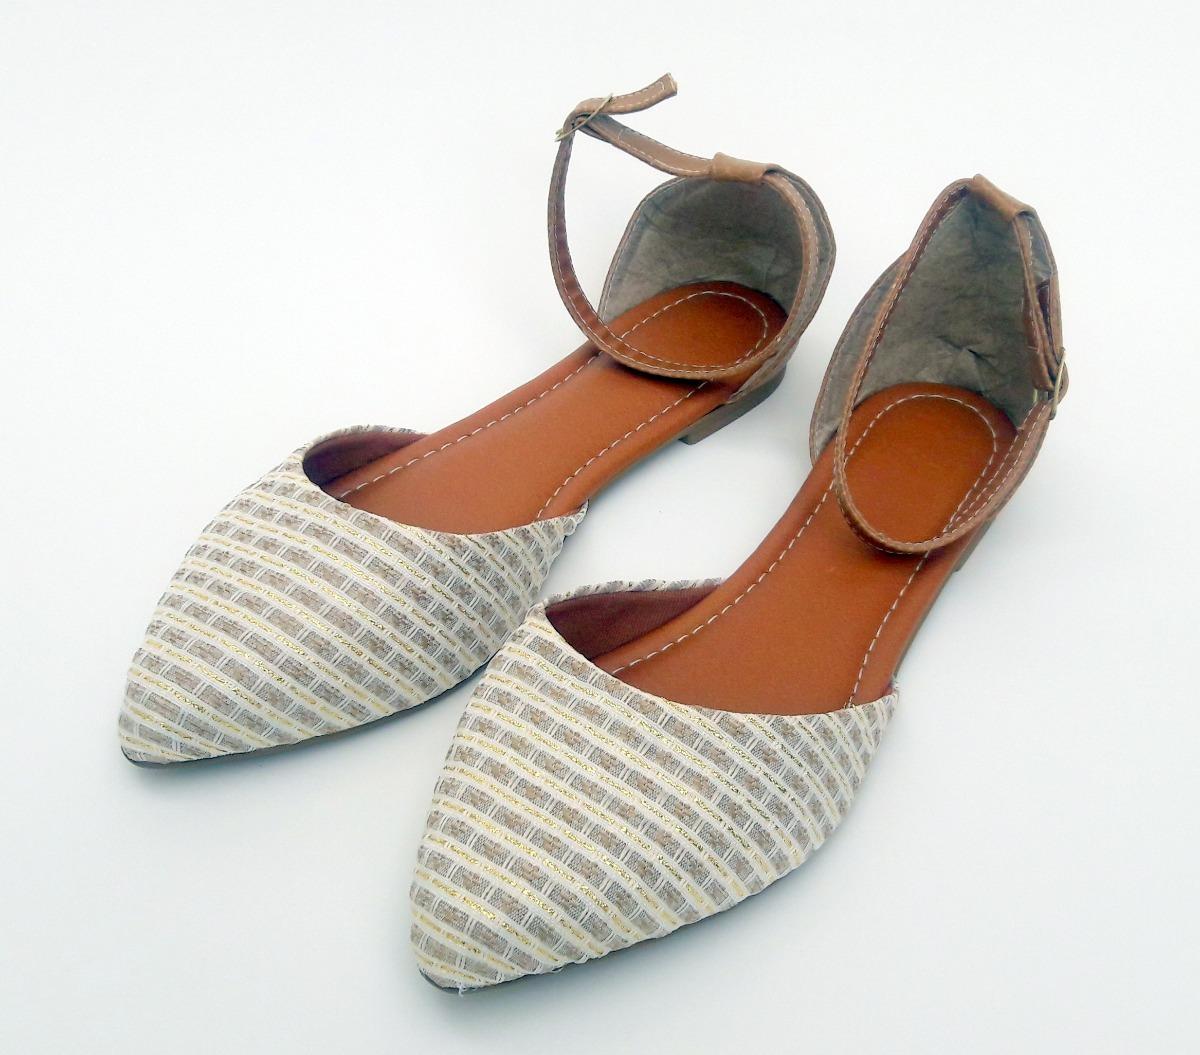 634ab1e732 sapatilha feminina rasteira salomé sandalia bico fino. Carregando zoom.